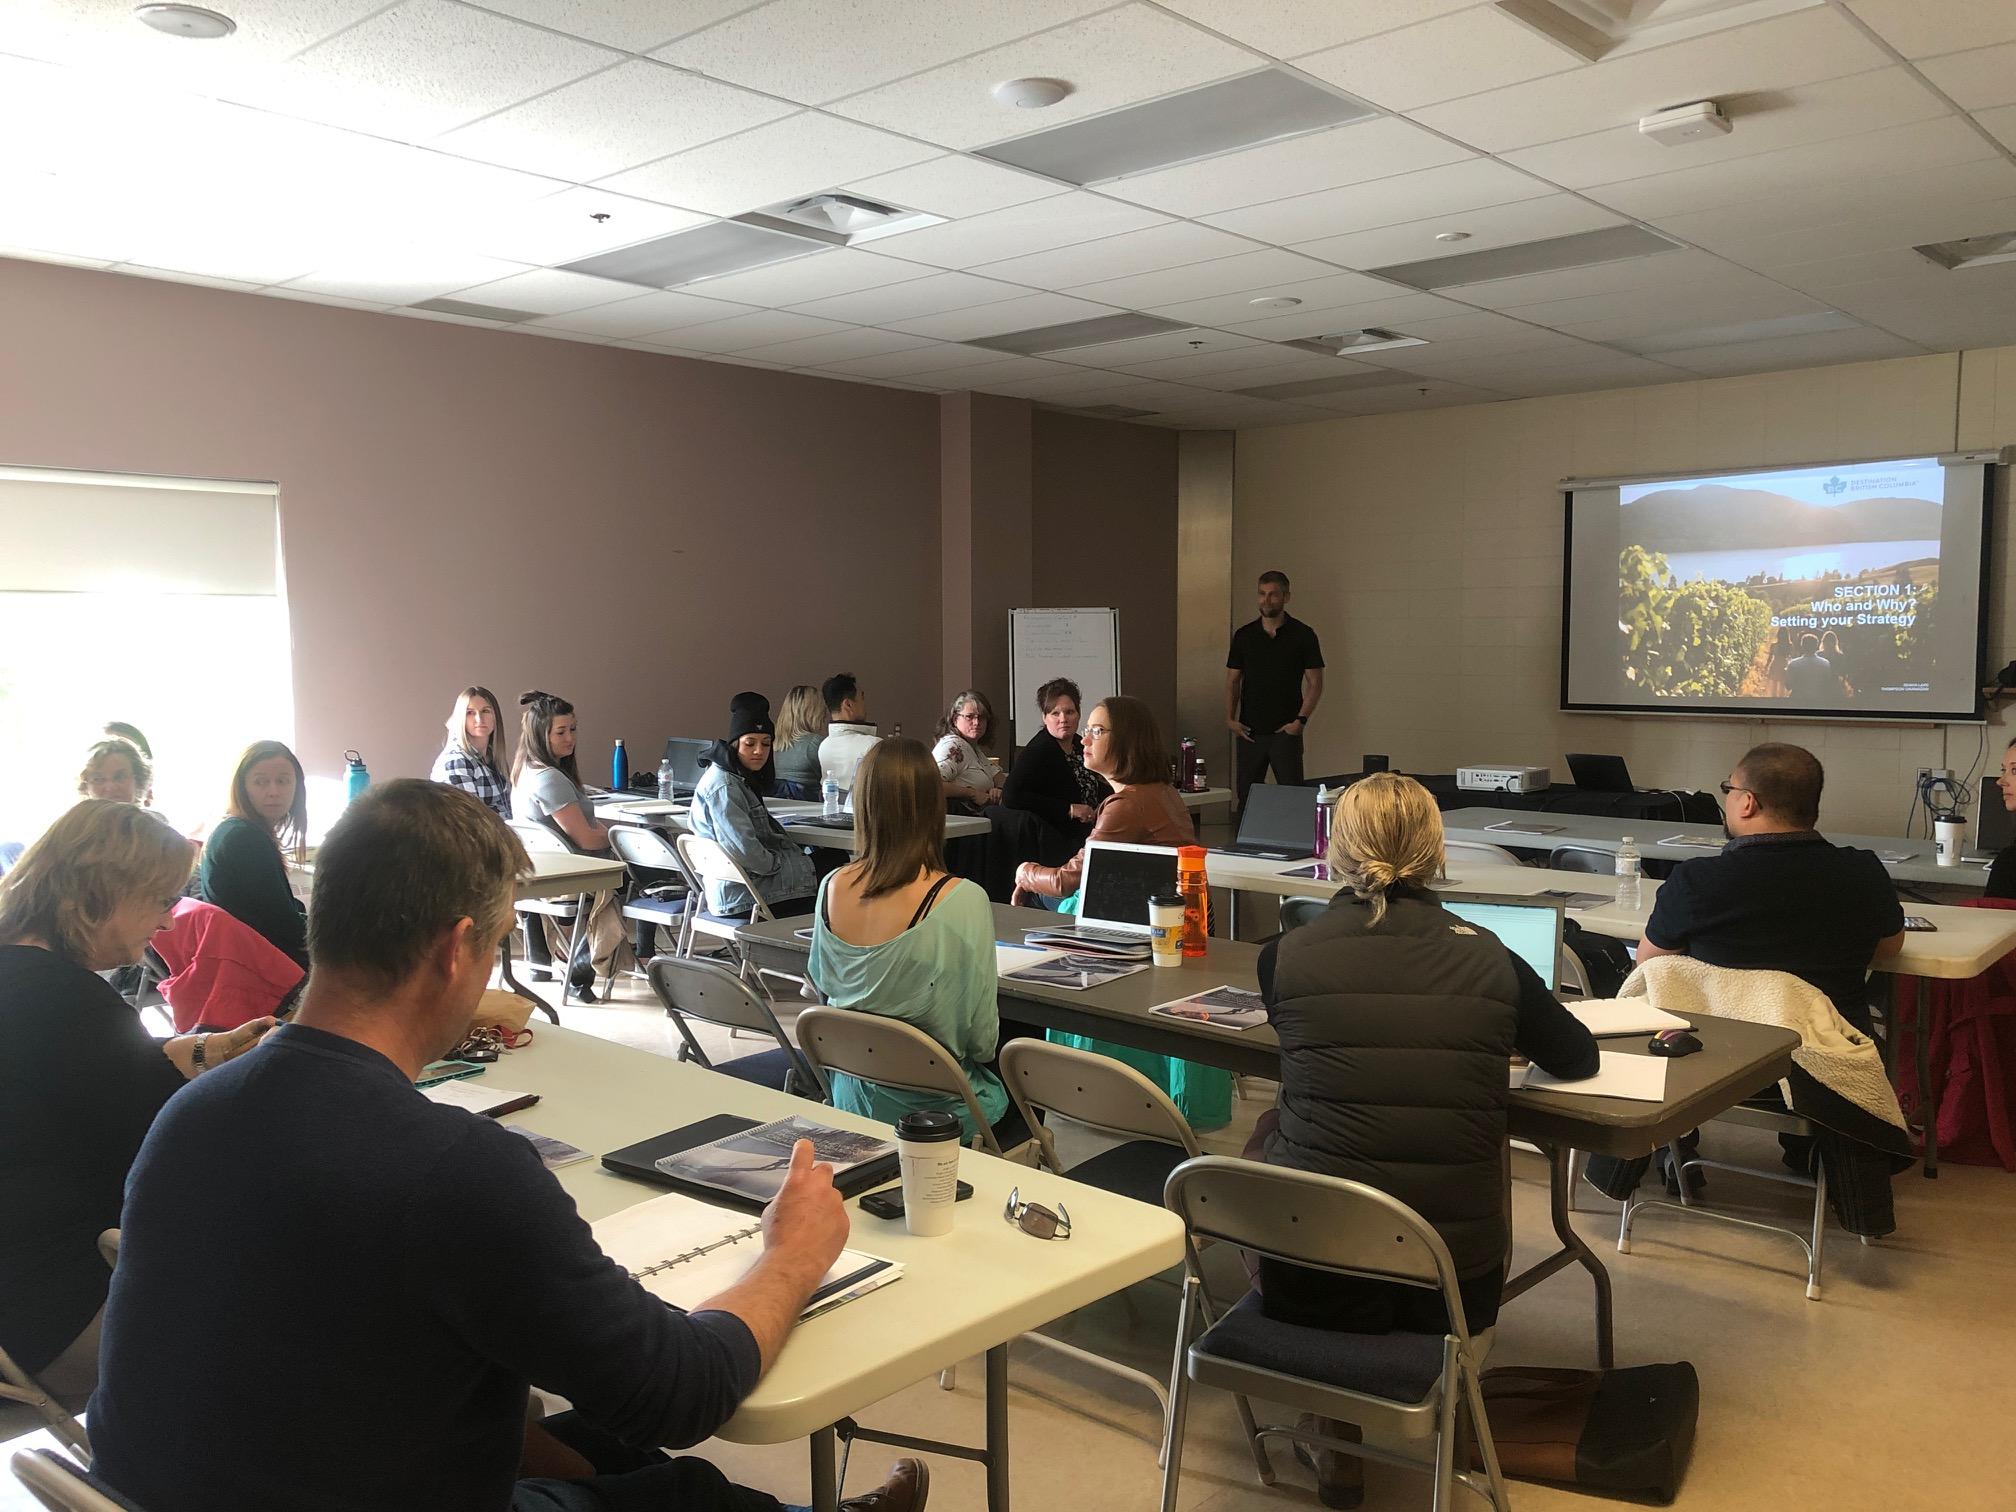 Content Marketing Workshop in Fort St. John